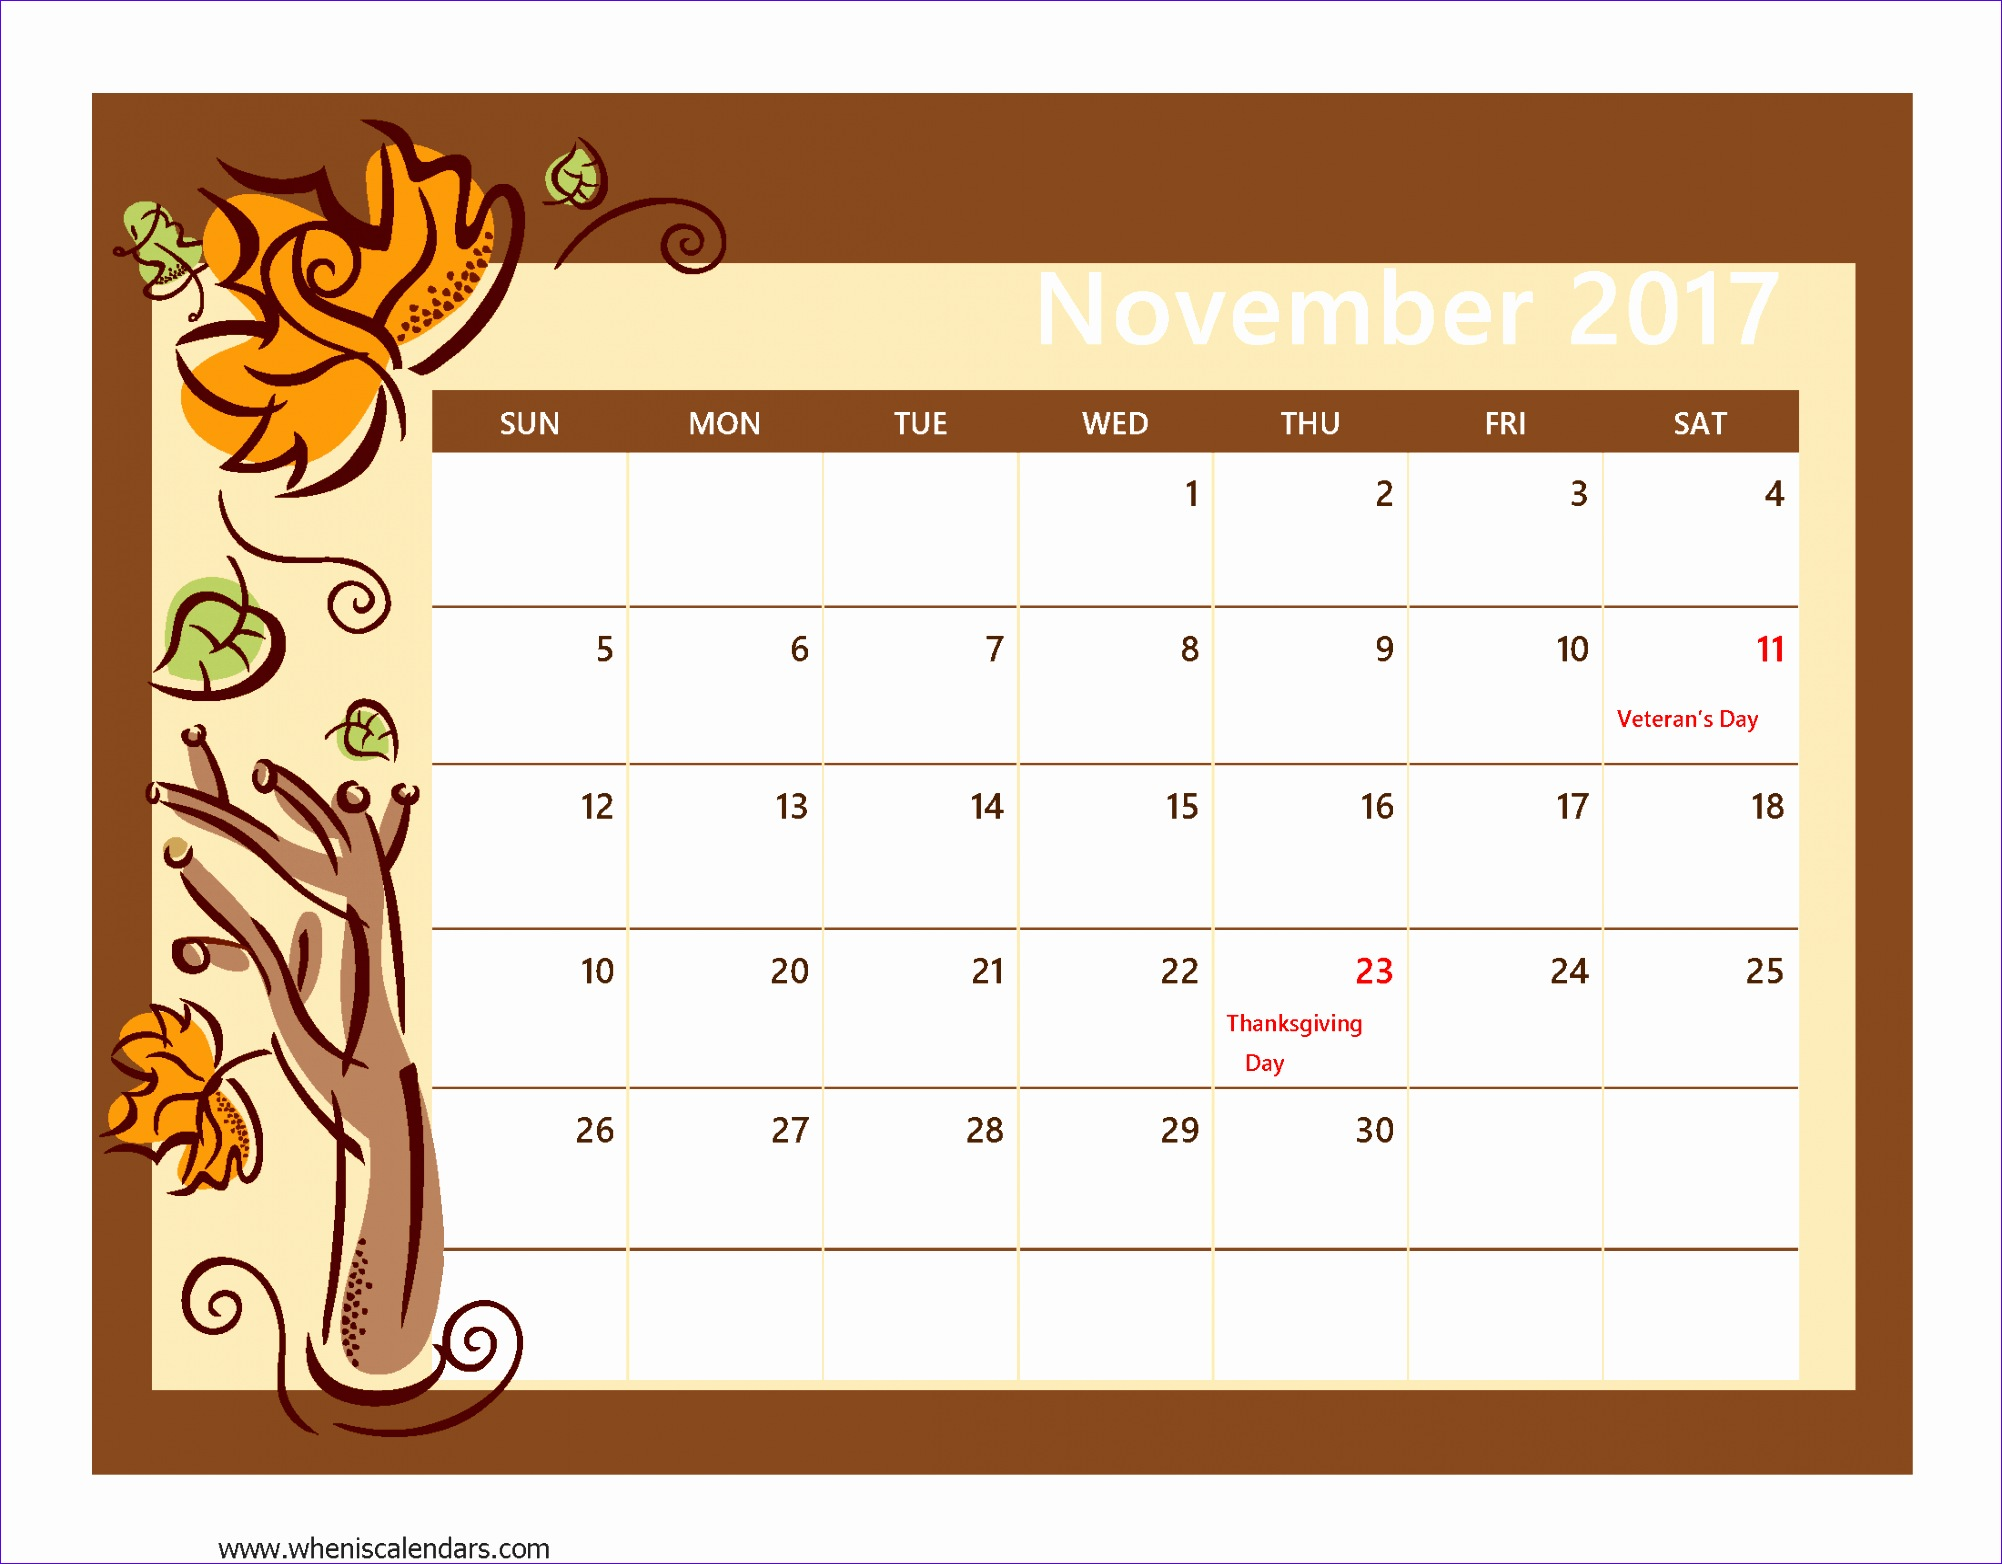 november 2017 calendar template 1249 20021564